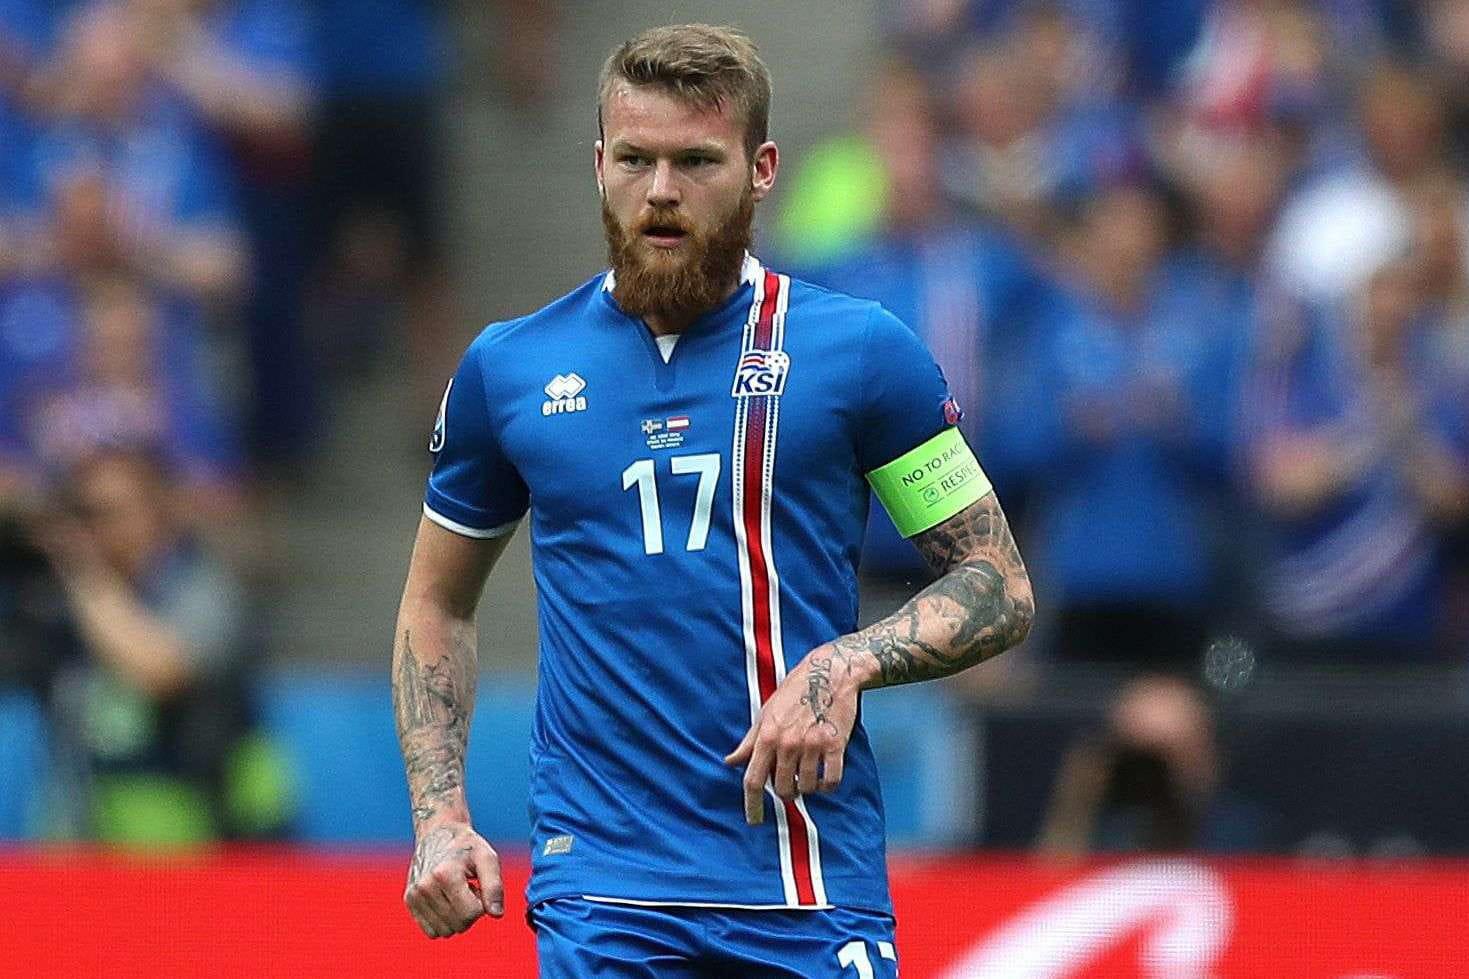 R sultat angleterre islande suivez le score du match en direct linternaute - Resultat coupe angleterre ...